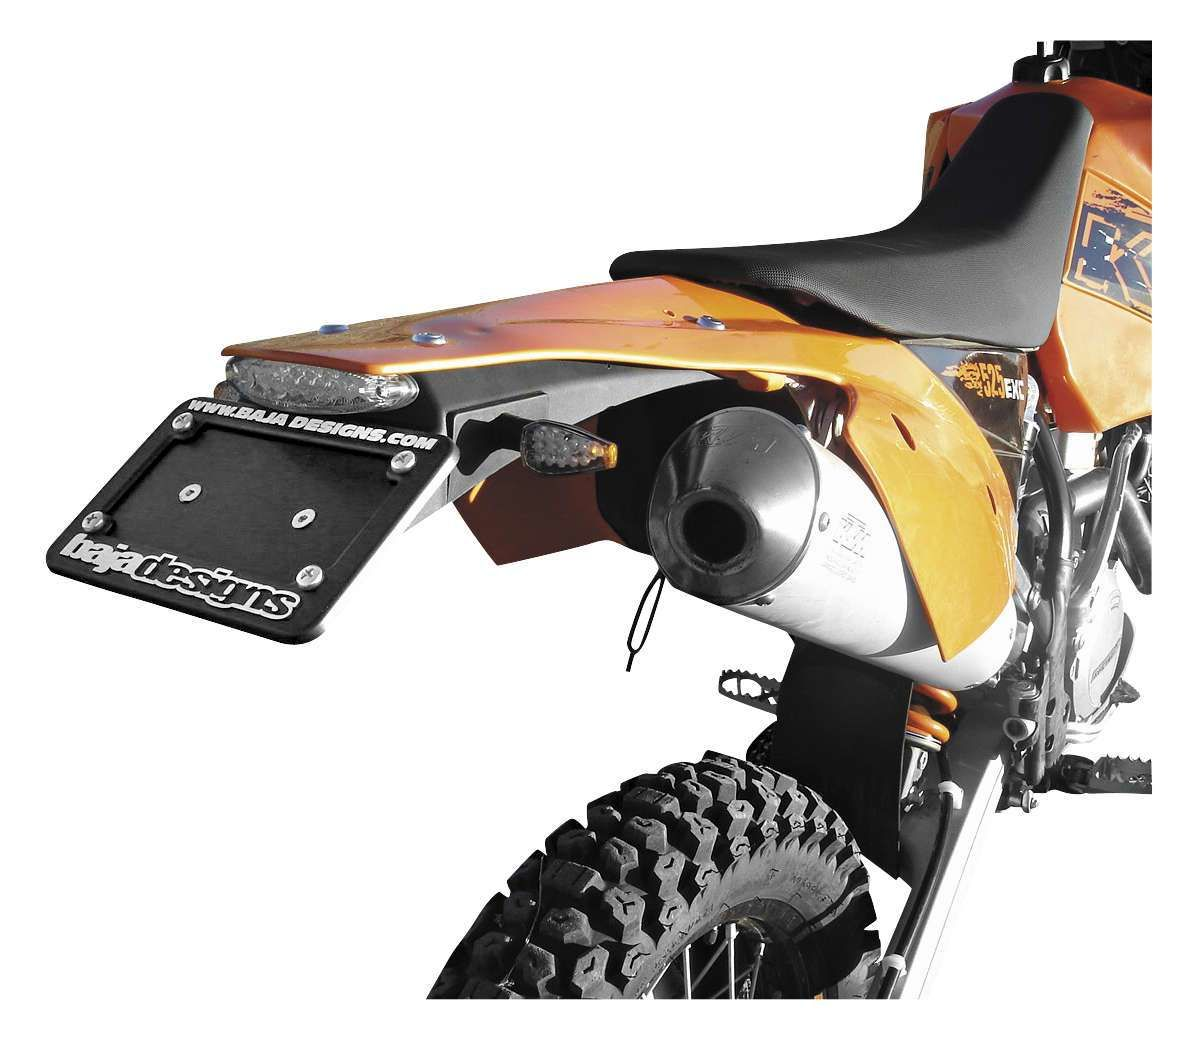 Ktm 450 Exc Parts Alles Ber Motorrad Bildideen 2012 Xc W Wiring Diagram Baja Designs Upgrade Kit 525 2007 2009 Revzilla